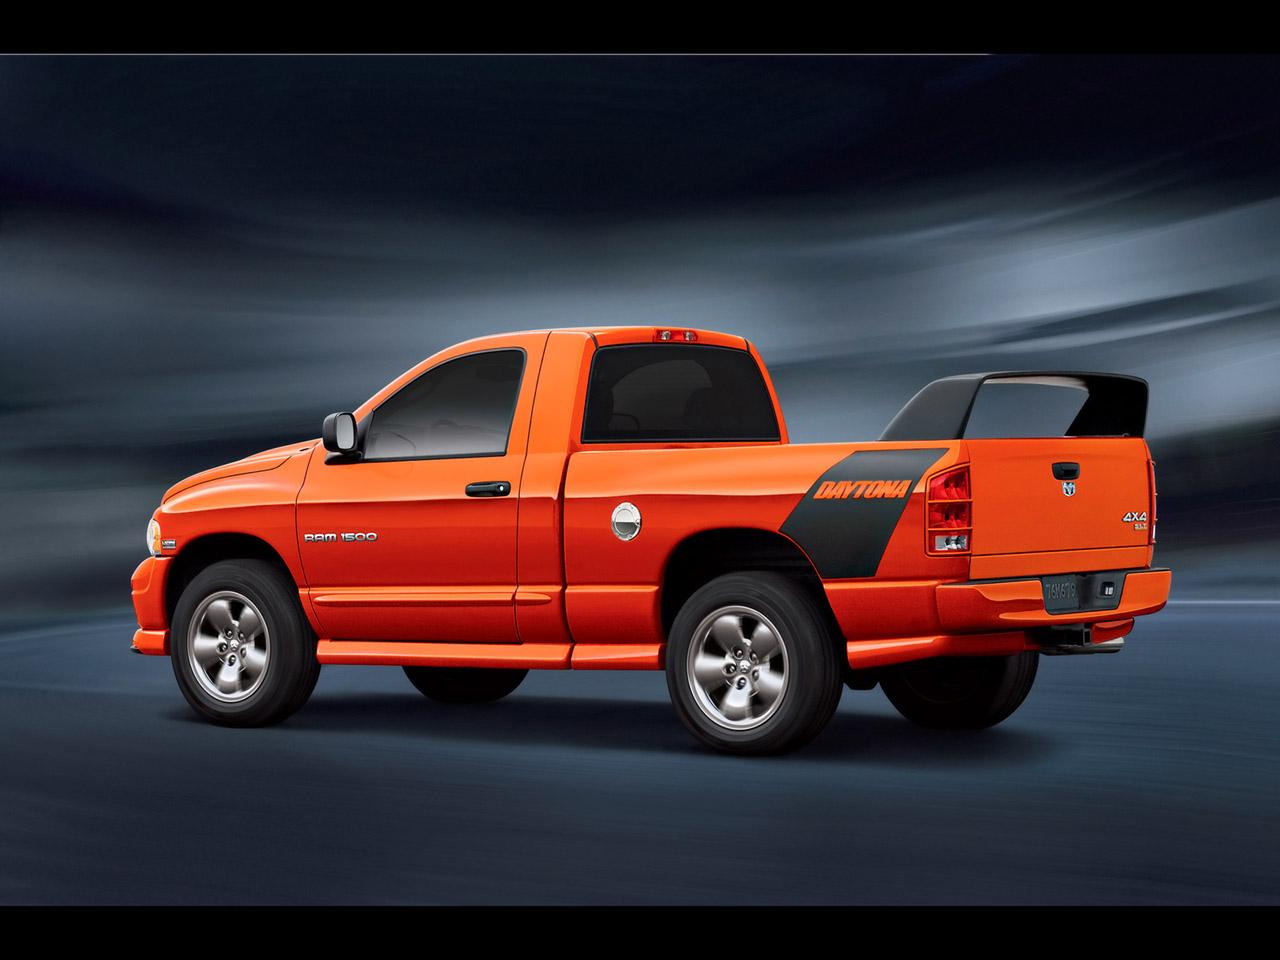 Dodge Ram Wallpaper 6538 Hd Wallpapers in Cars   Imagescicom 1280x960